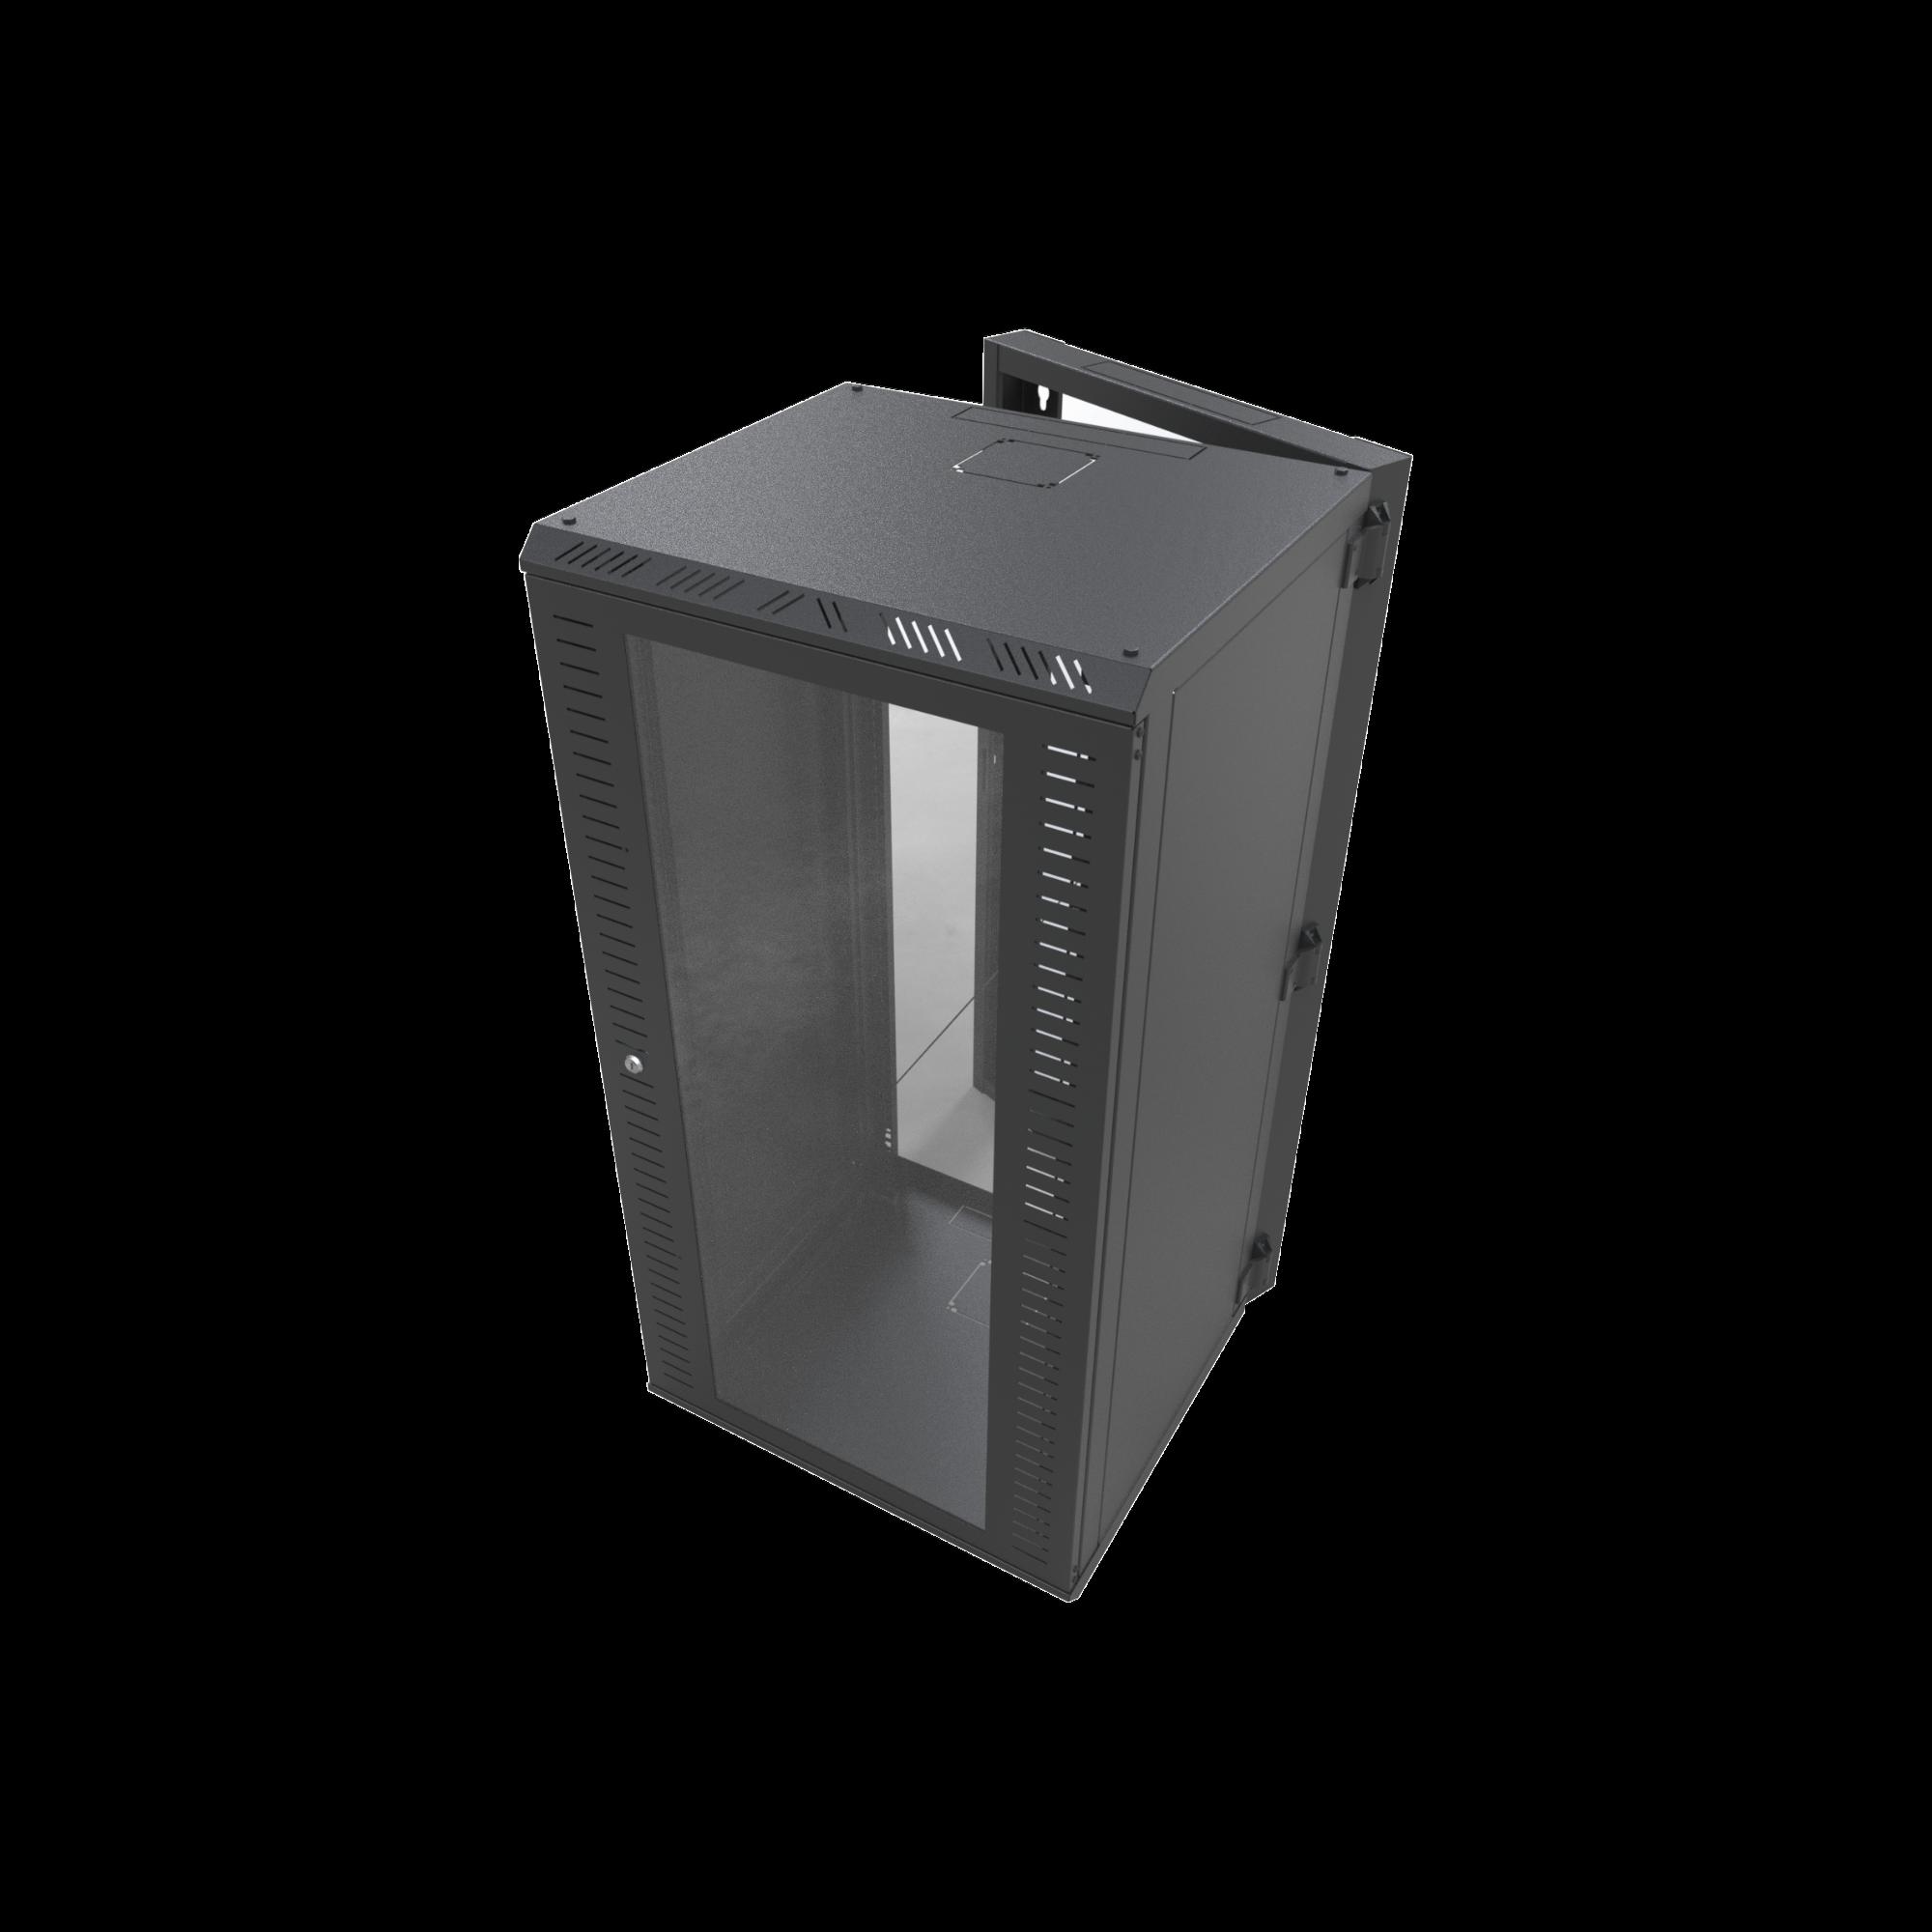 Gabinete Abatible para Montaje en Pared con Rack 19 de 24 Unidades Ventana de Cristal